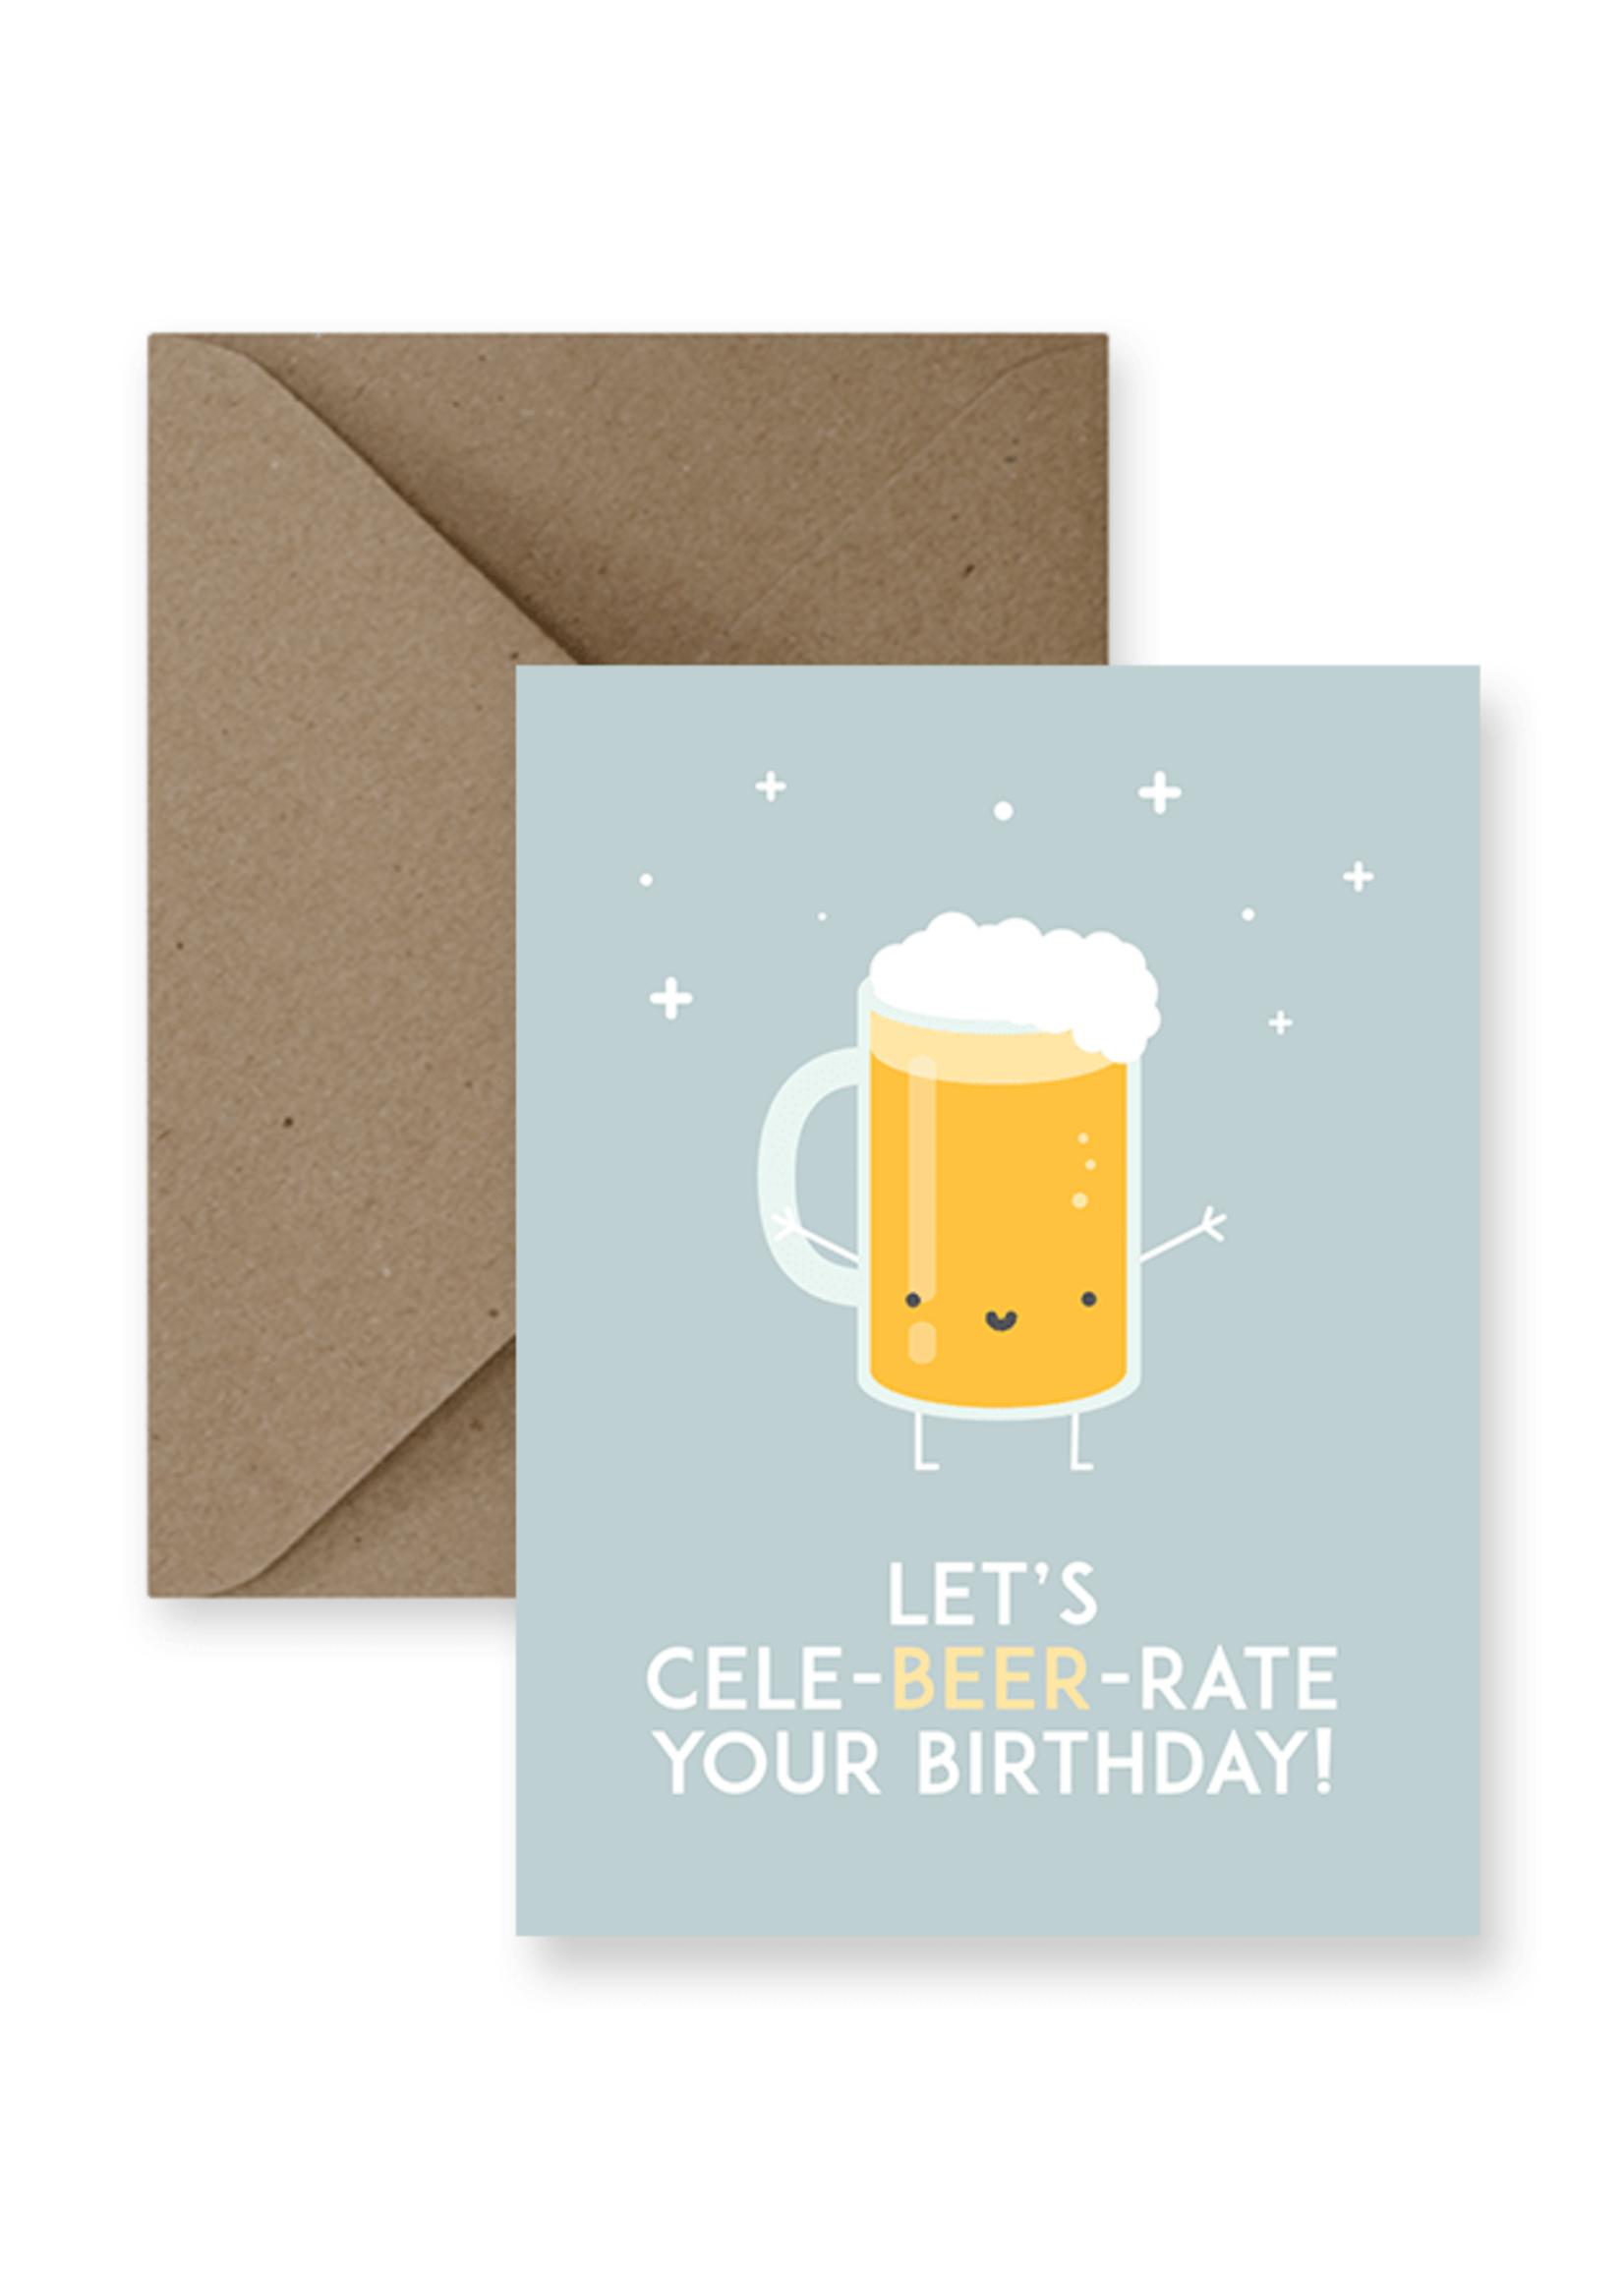 IMPAPER Cele-Beer-Ate Birthday